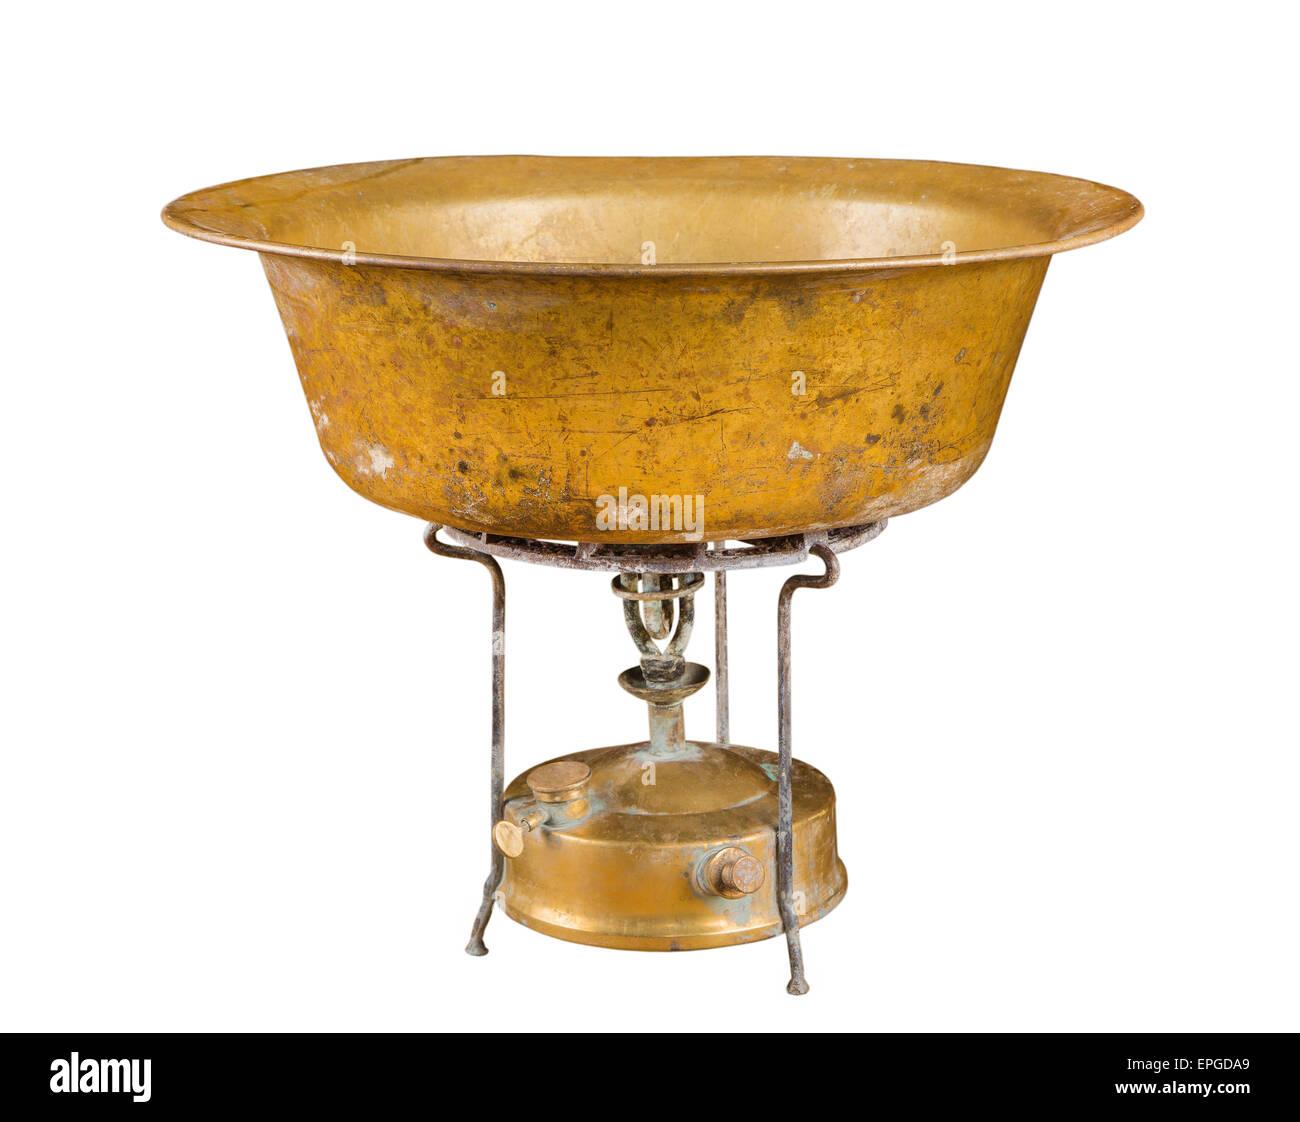 kerosene stove and copper basin - Stock Image